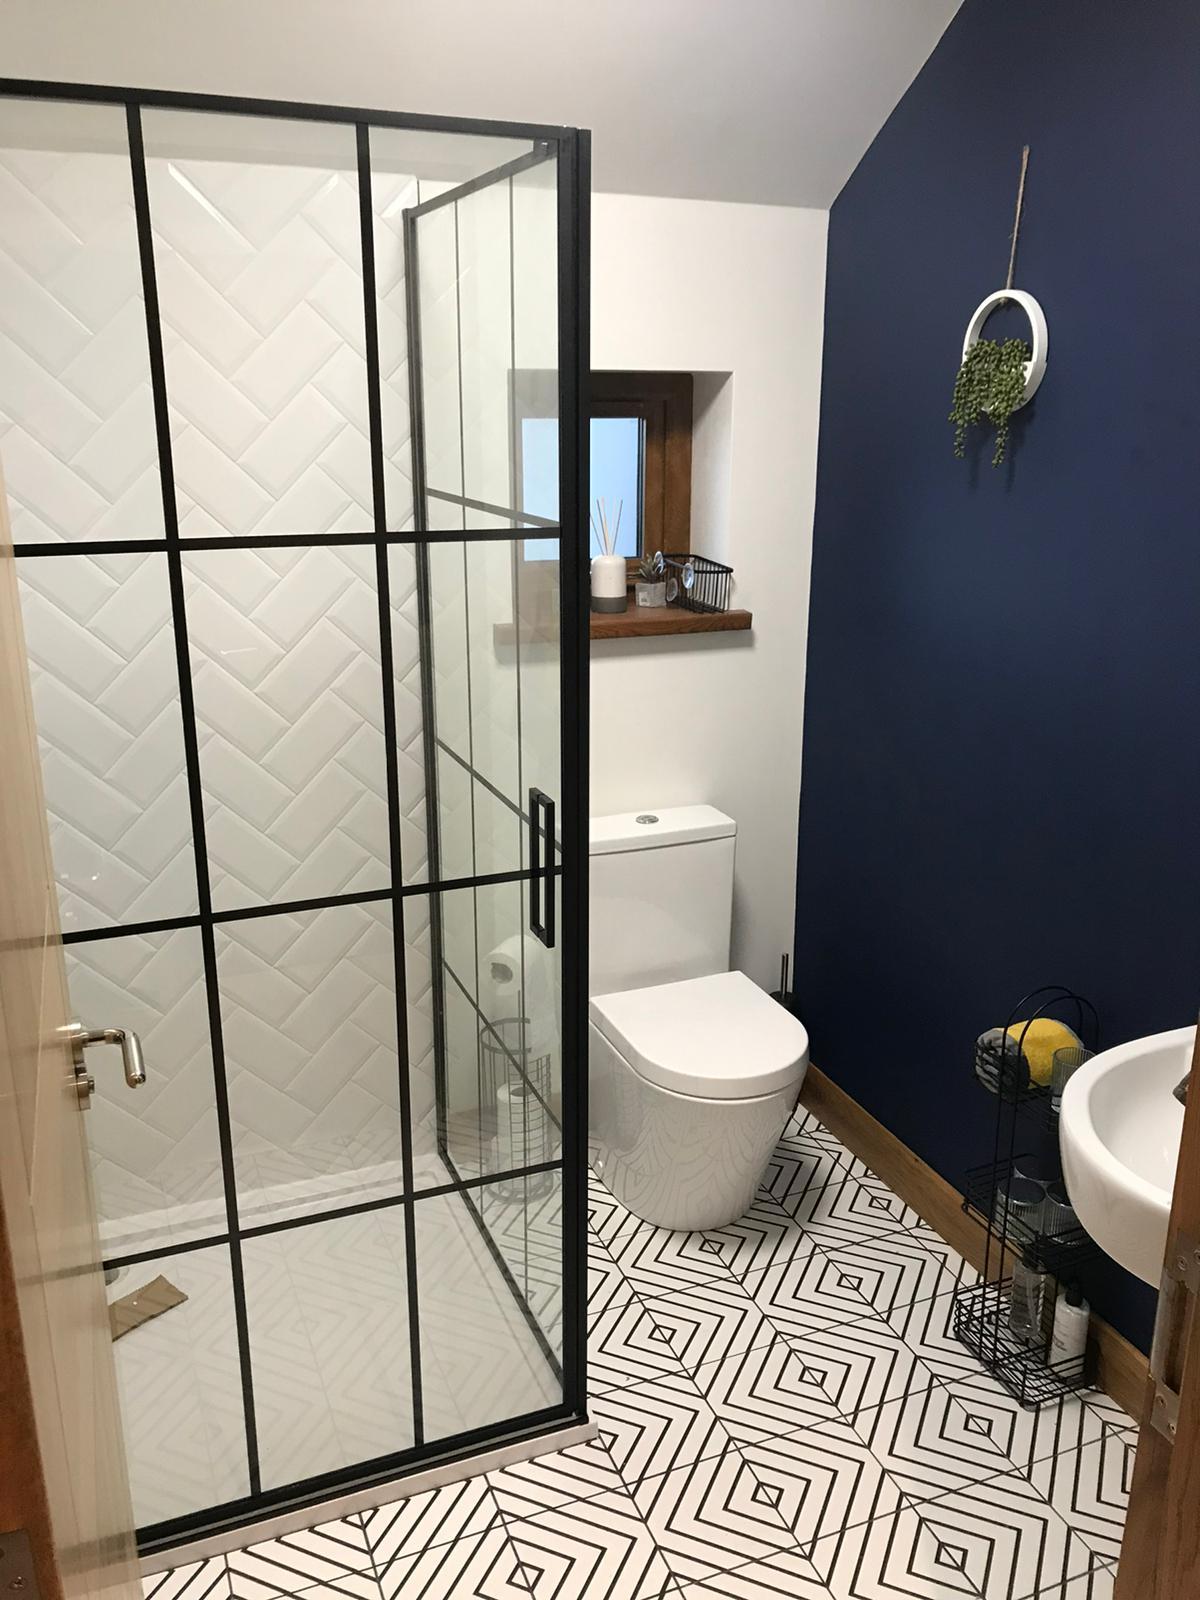 Shower room refurbishment Tobermore